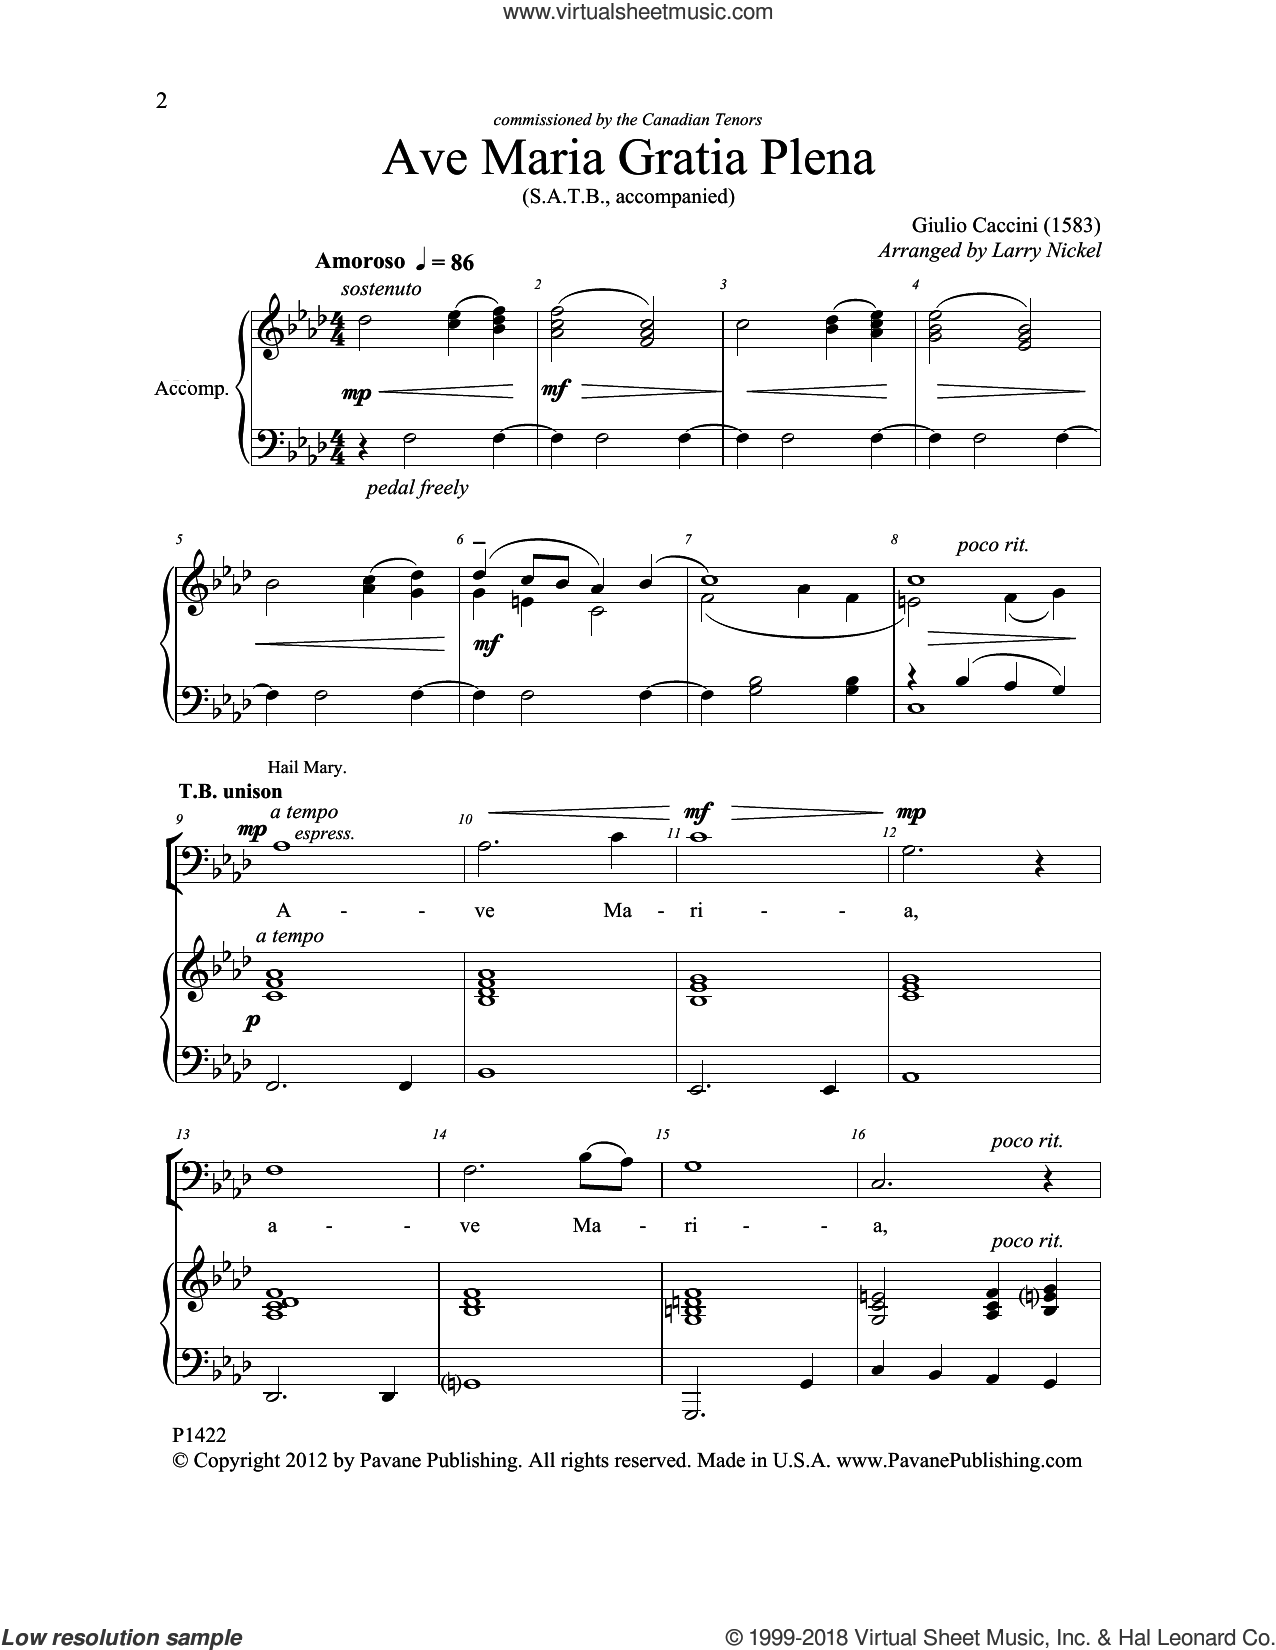 Ave Maria Gratia Plena sheet music for choir (SATB: soprano, alto, tenor, bass) by Larry Nickel and Canccini, intermediate skill level